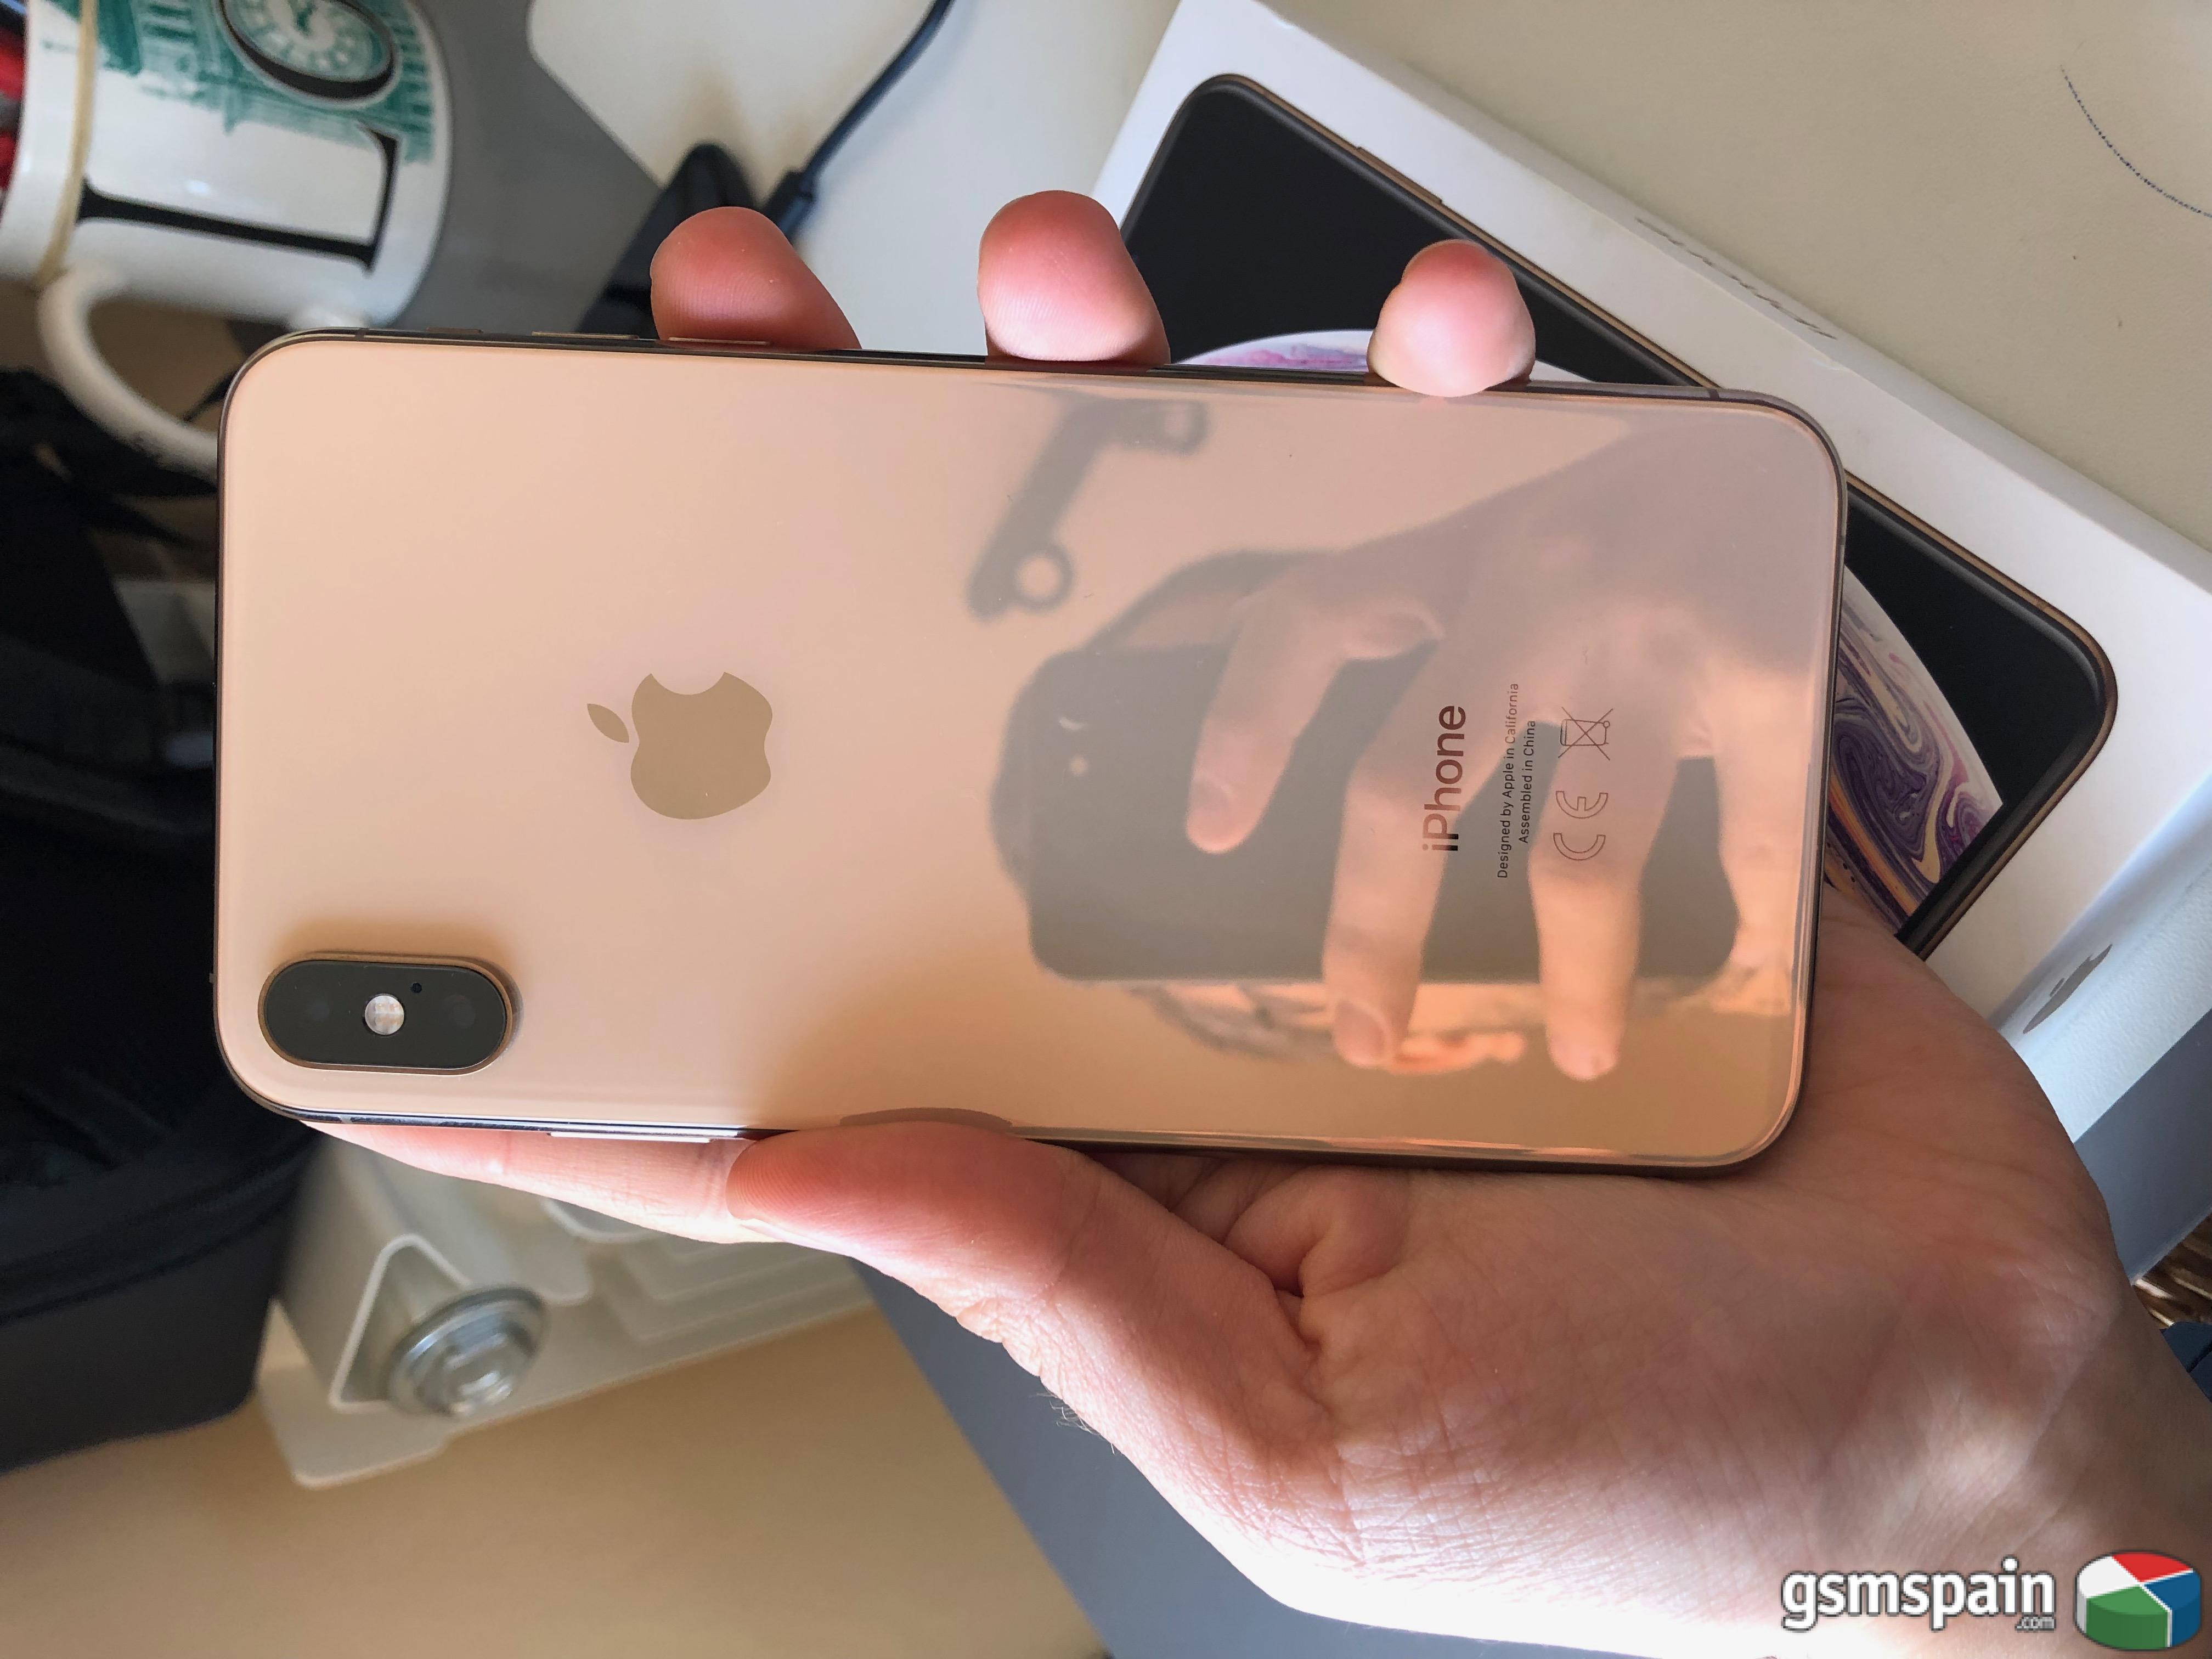 [VENDO] *** iPhone XS Max 64GB Dorado + Garantía ***